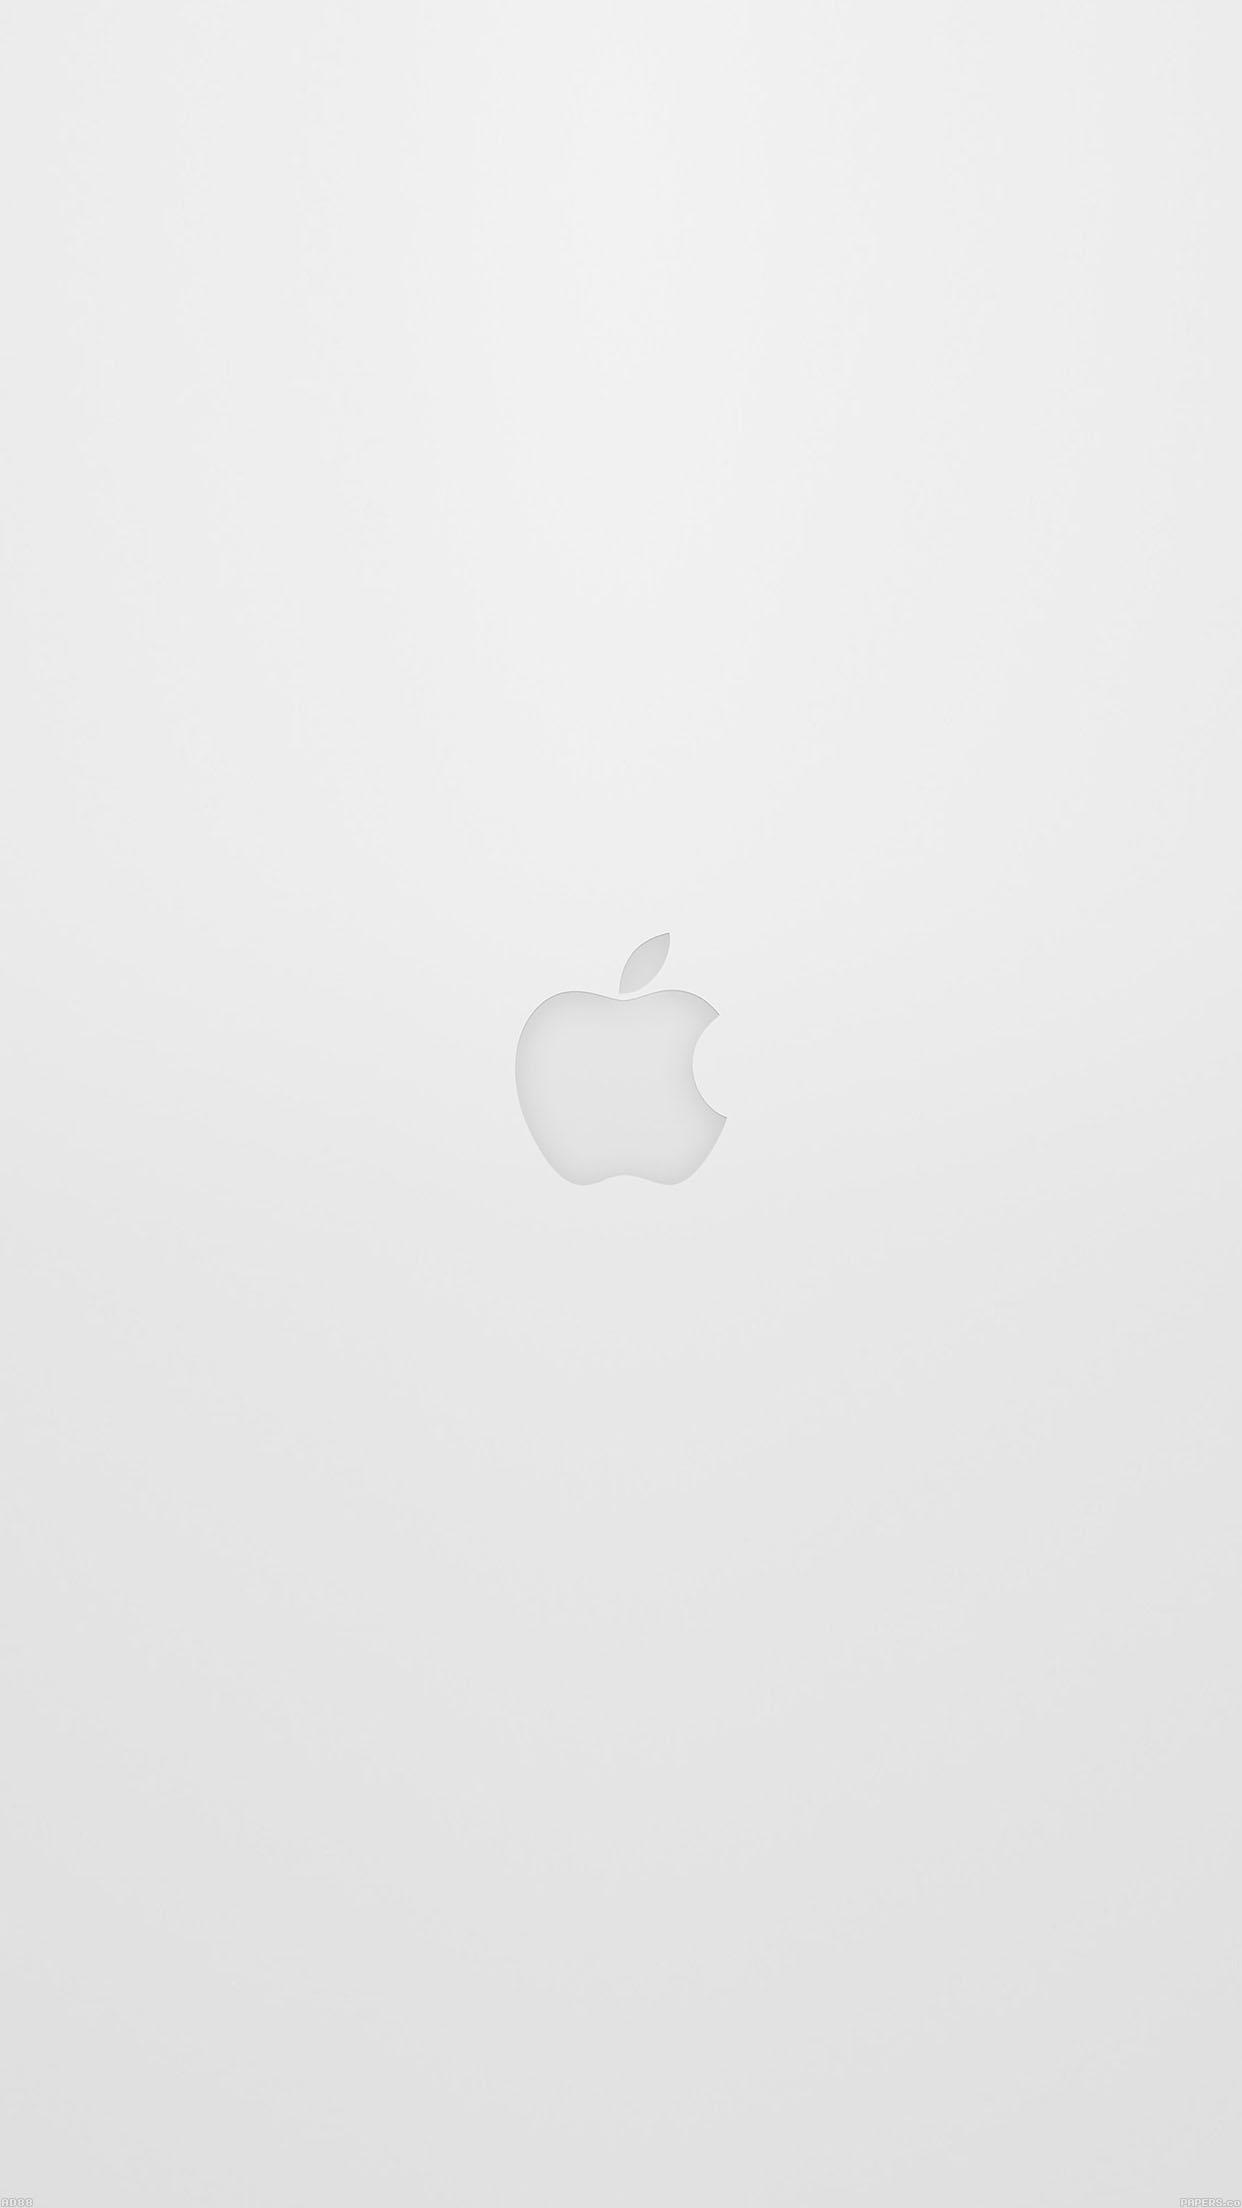 apple logo wallpaper iphone 8 plus